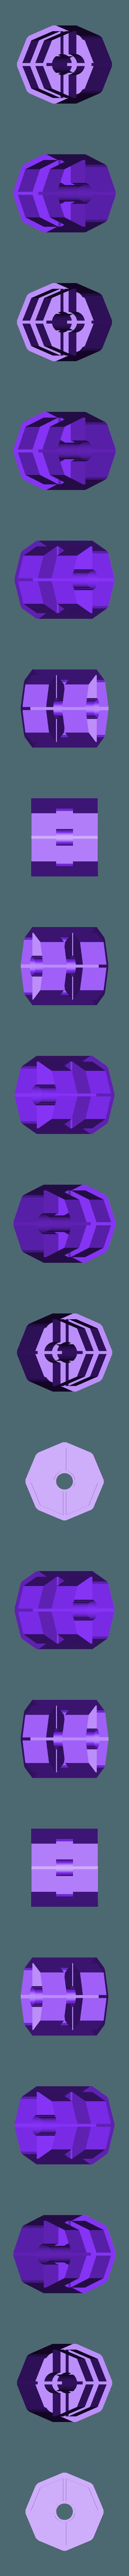 "devidoir_part_roue01.STL Download free STL file ""Monsteranimal T-Rex"" tape dispenser • 3D print design, Tibe-Design"